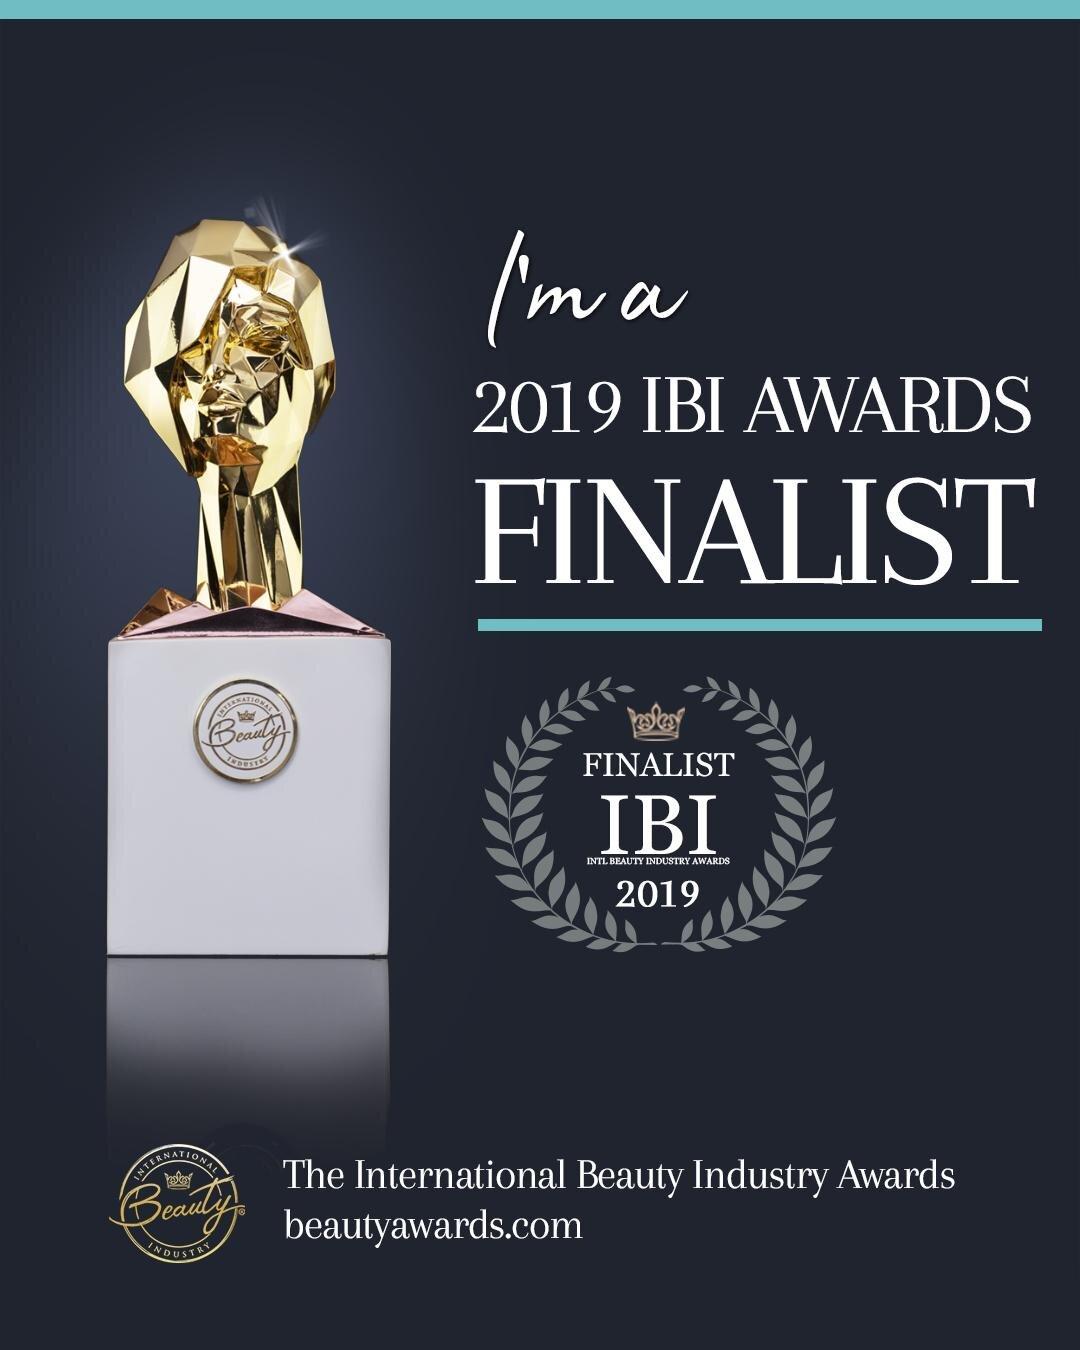 - 2019 IBI Award Finalist